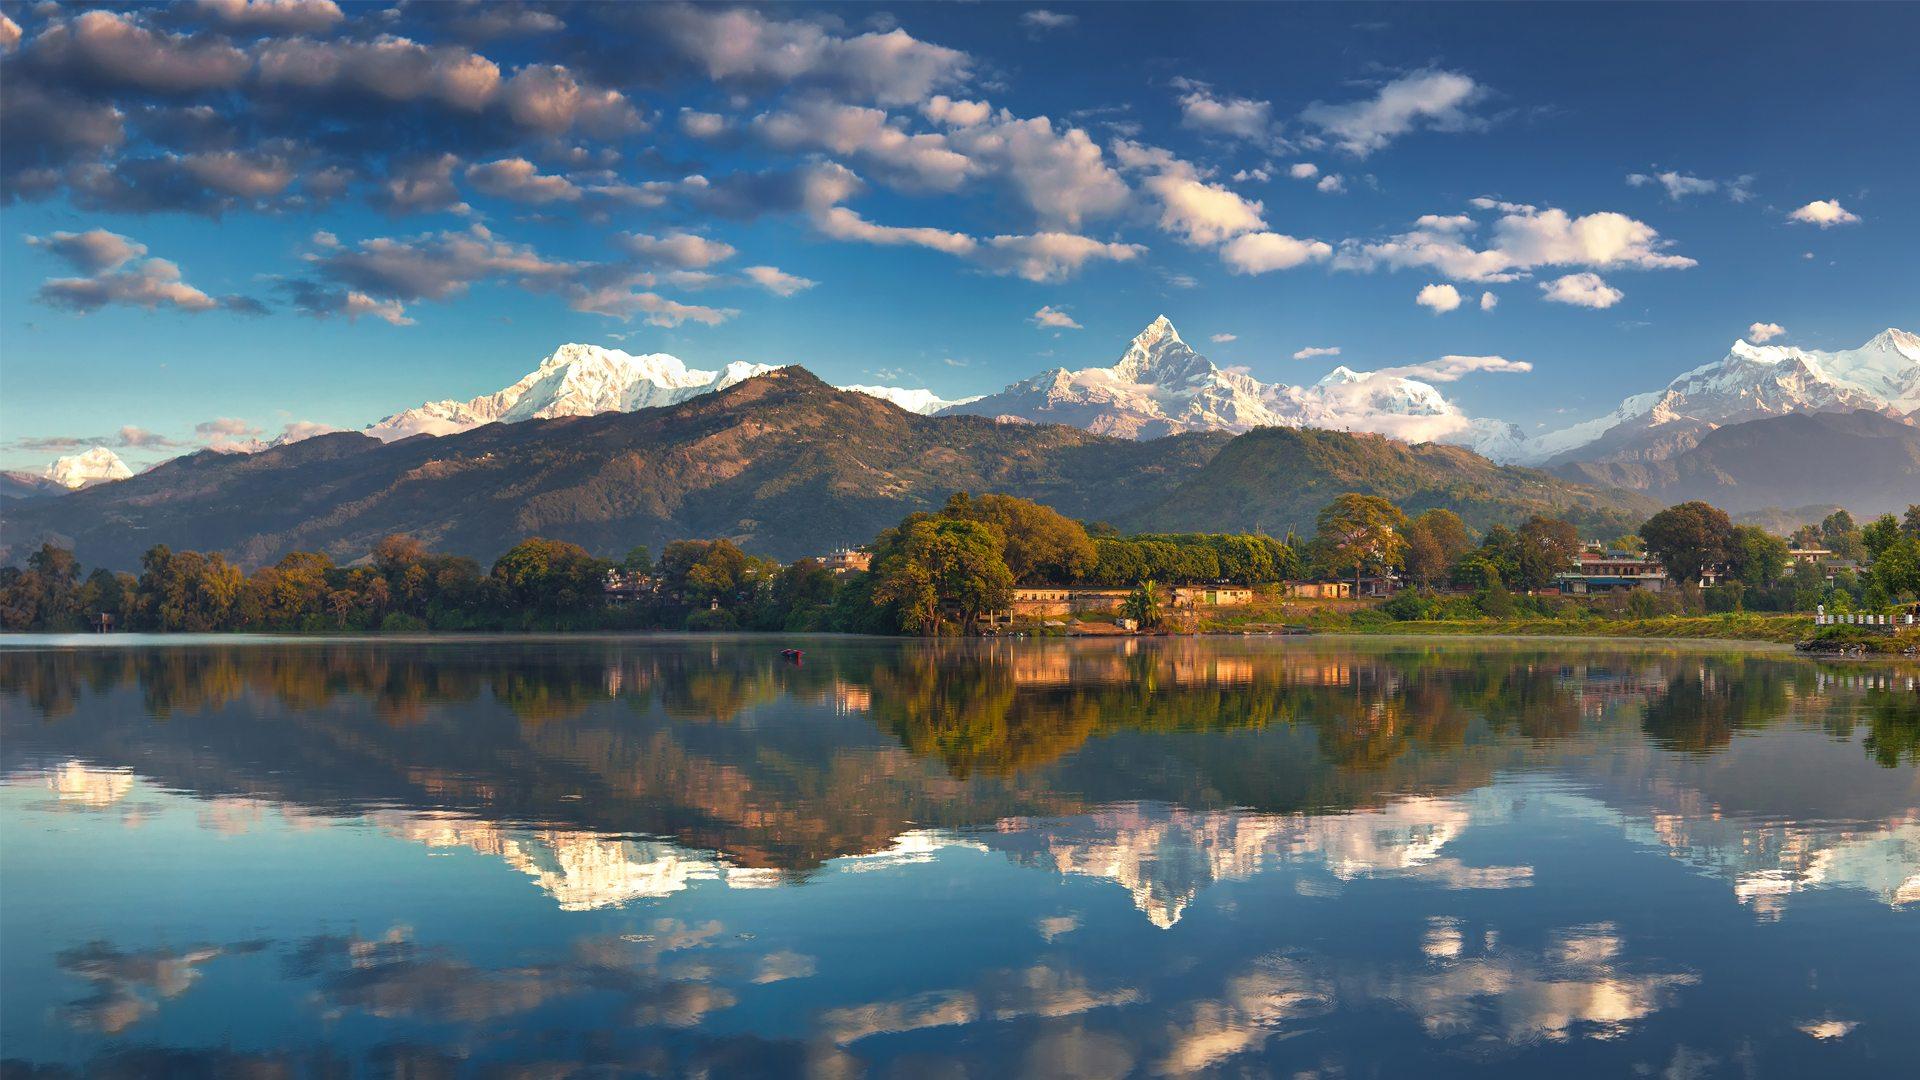 Why visit Pokhara? | Pokhara Valley | Jewel of the Himalaya